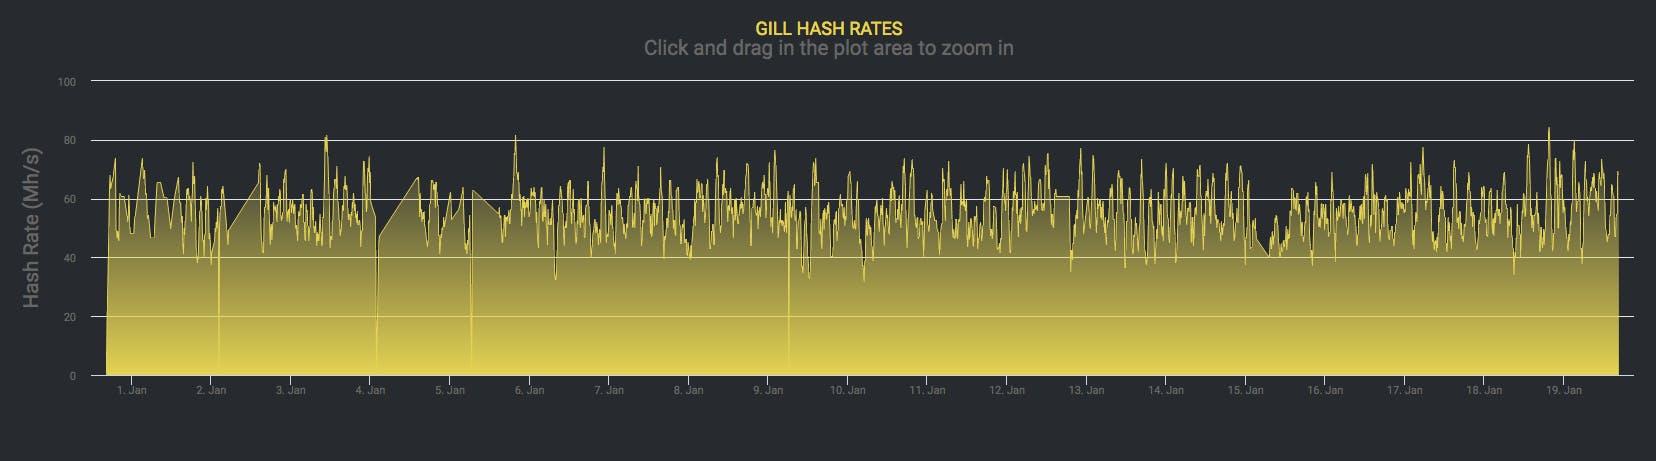 Full Hash Rate History